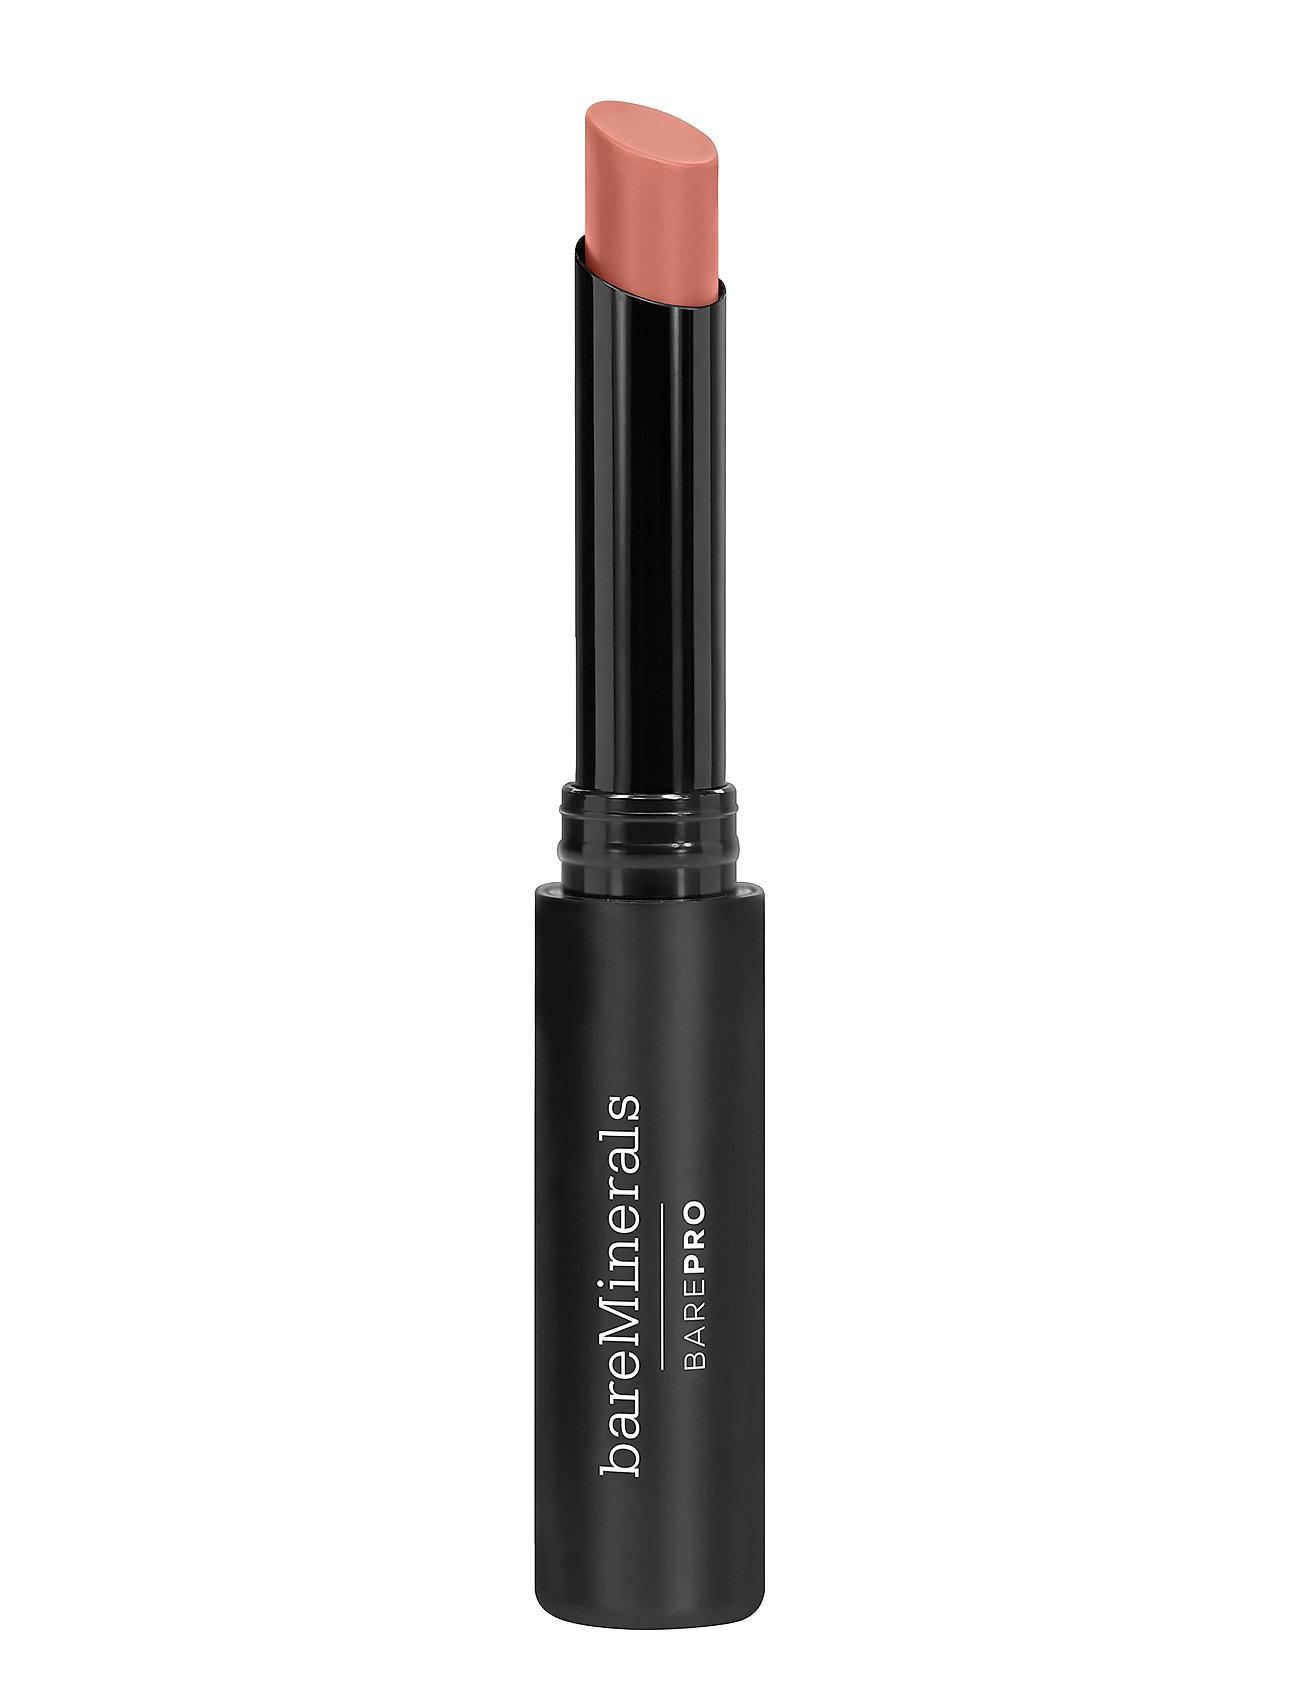 Image of Barepro Longwear Lipstick Camellia Læbestift Makeup Lyserød BareMinerals (3138616941)